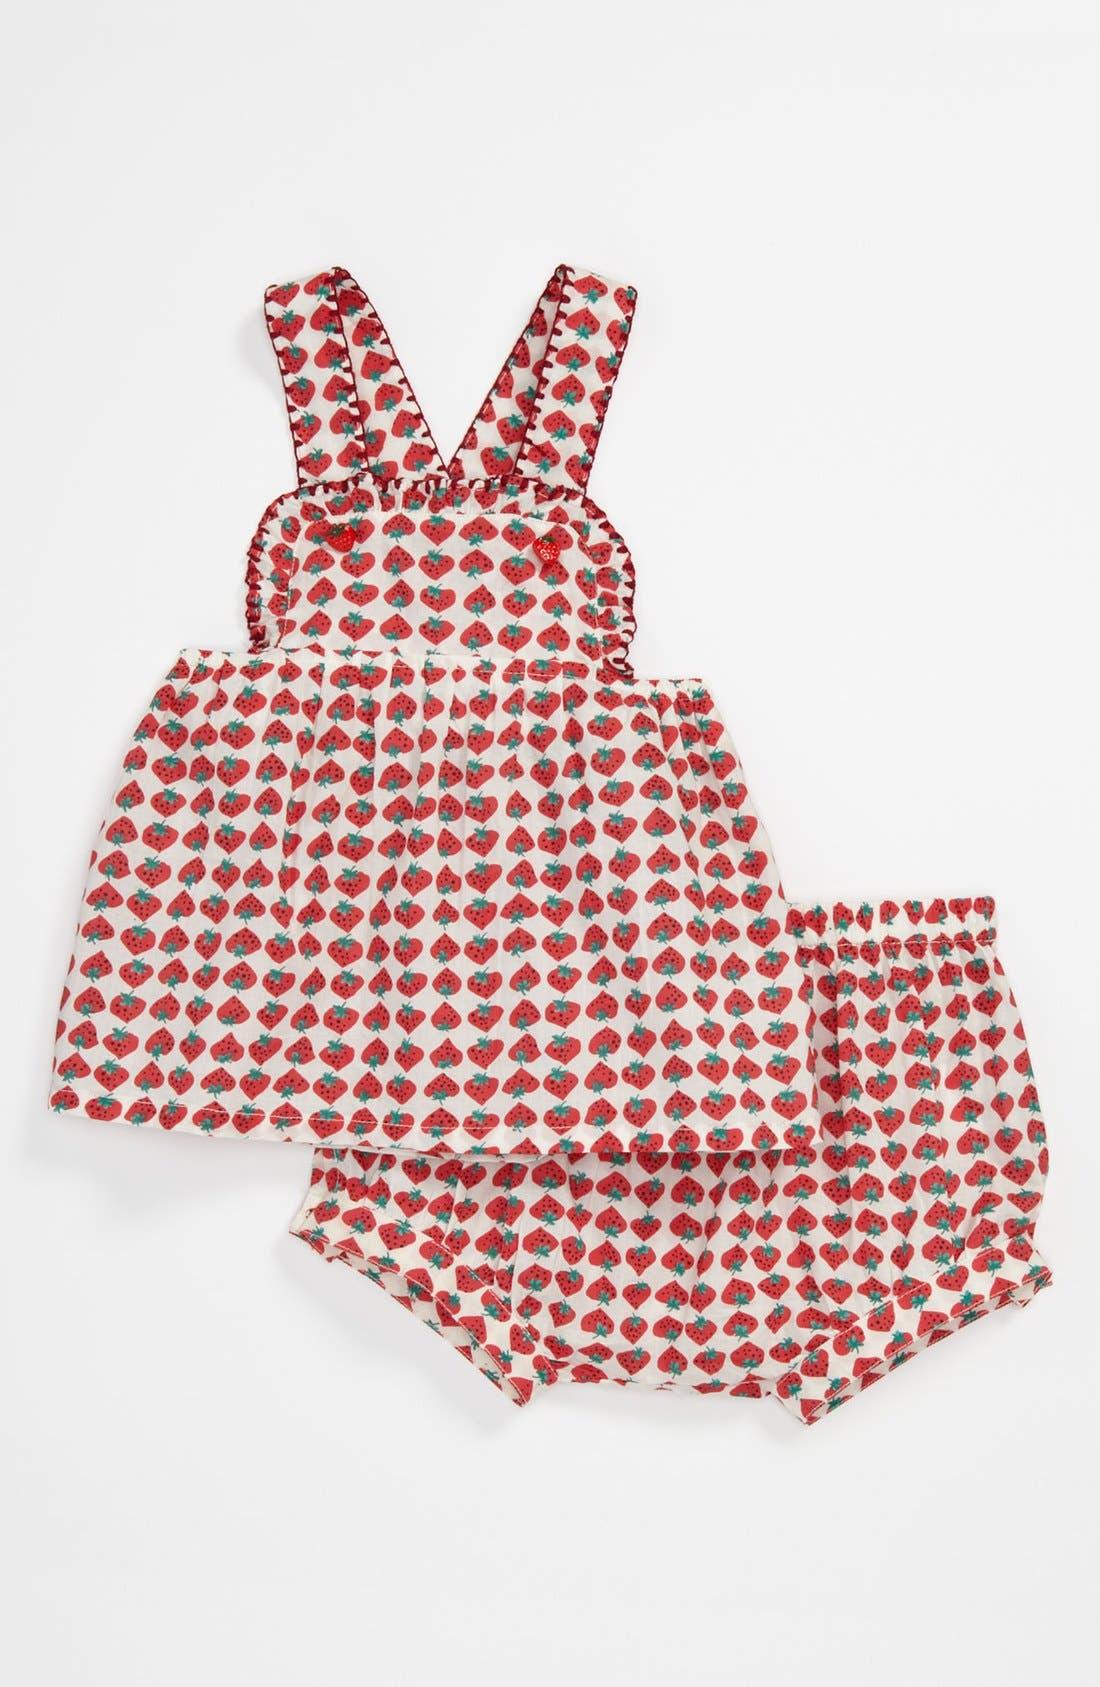 Alternate Image 1 Selected - Stella McCartney Kids 'Olivia' Dress & Bloomers (Baby)